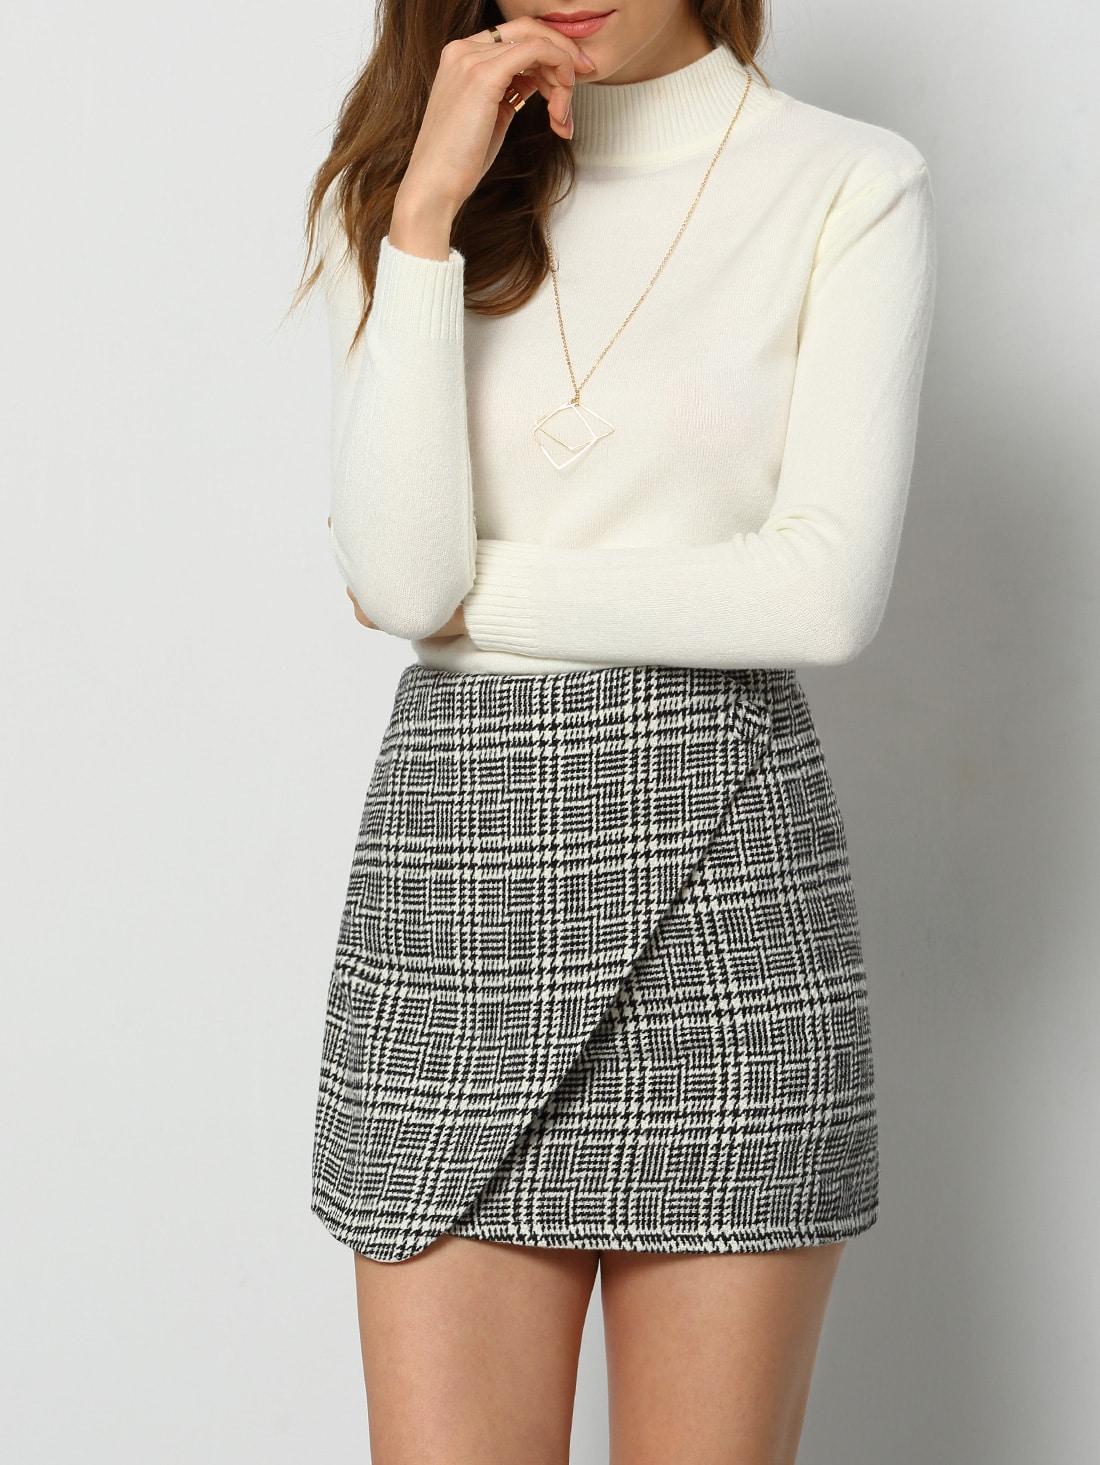 Black White Houndstooth Skirt -SheIn(Sheinside)